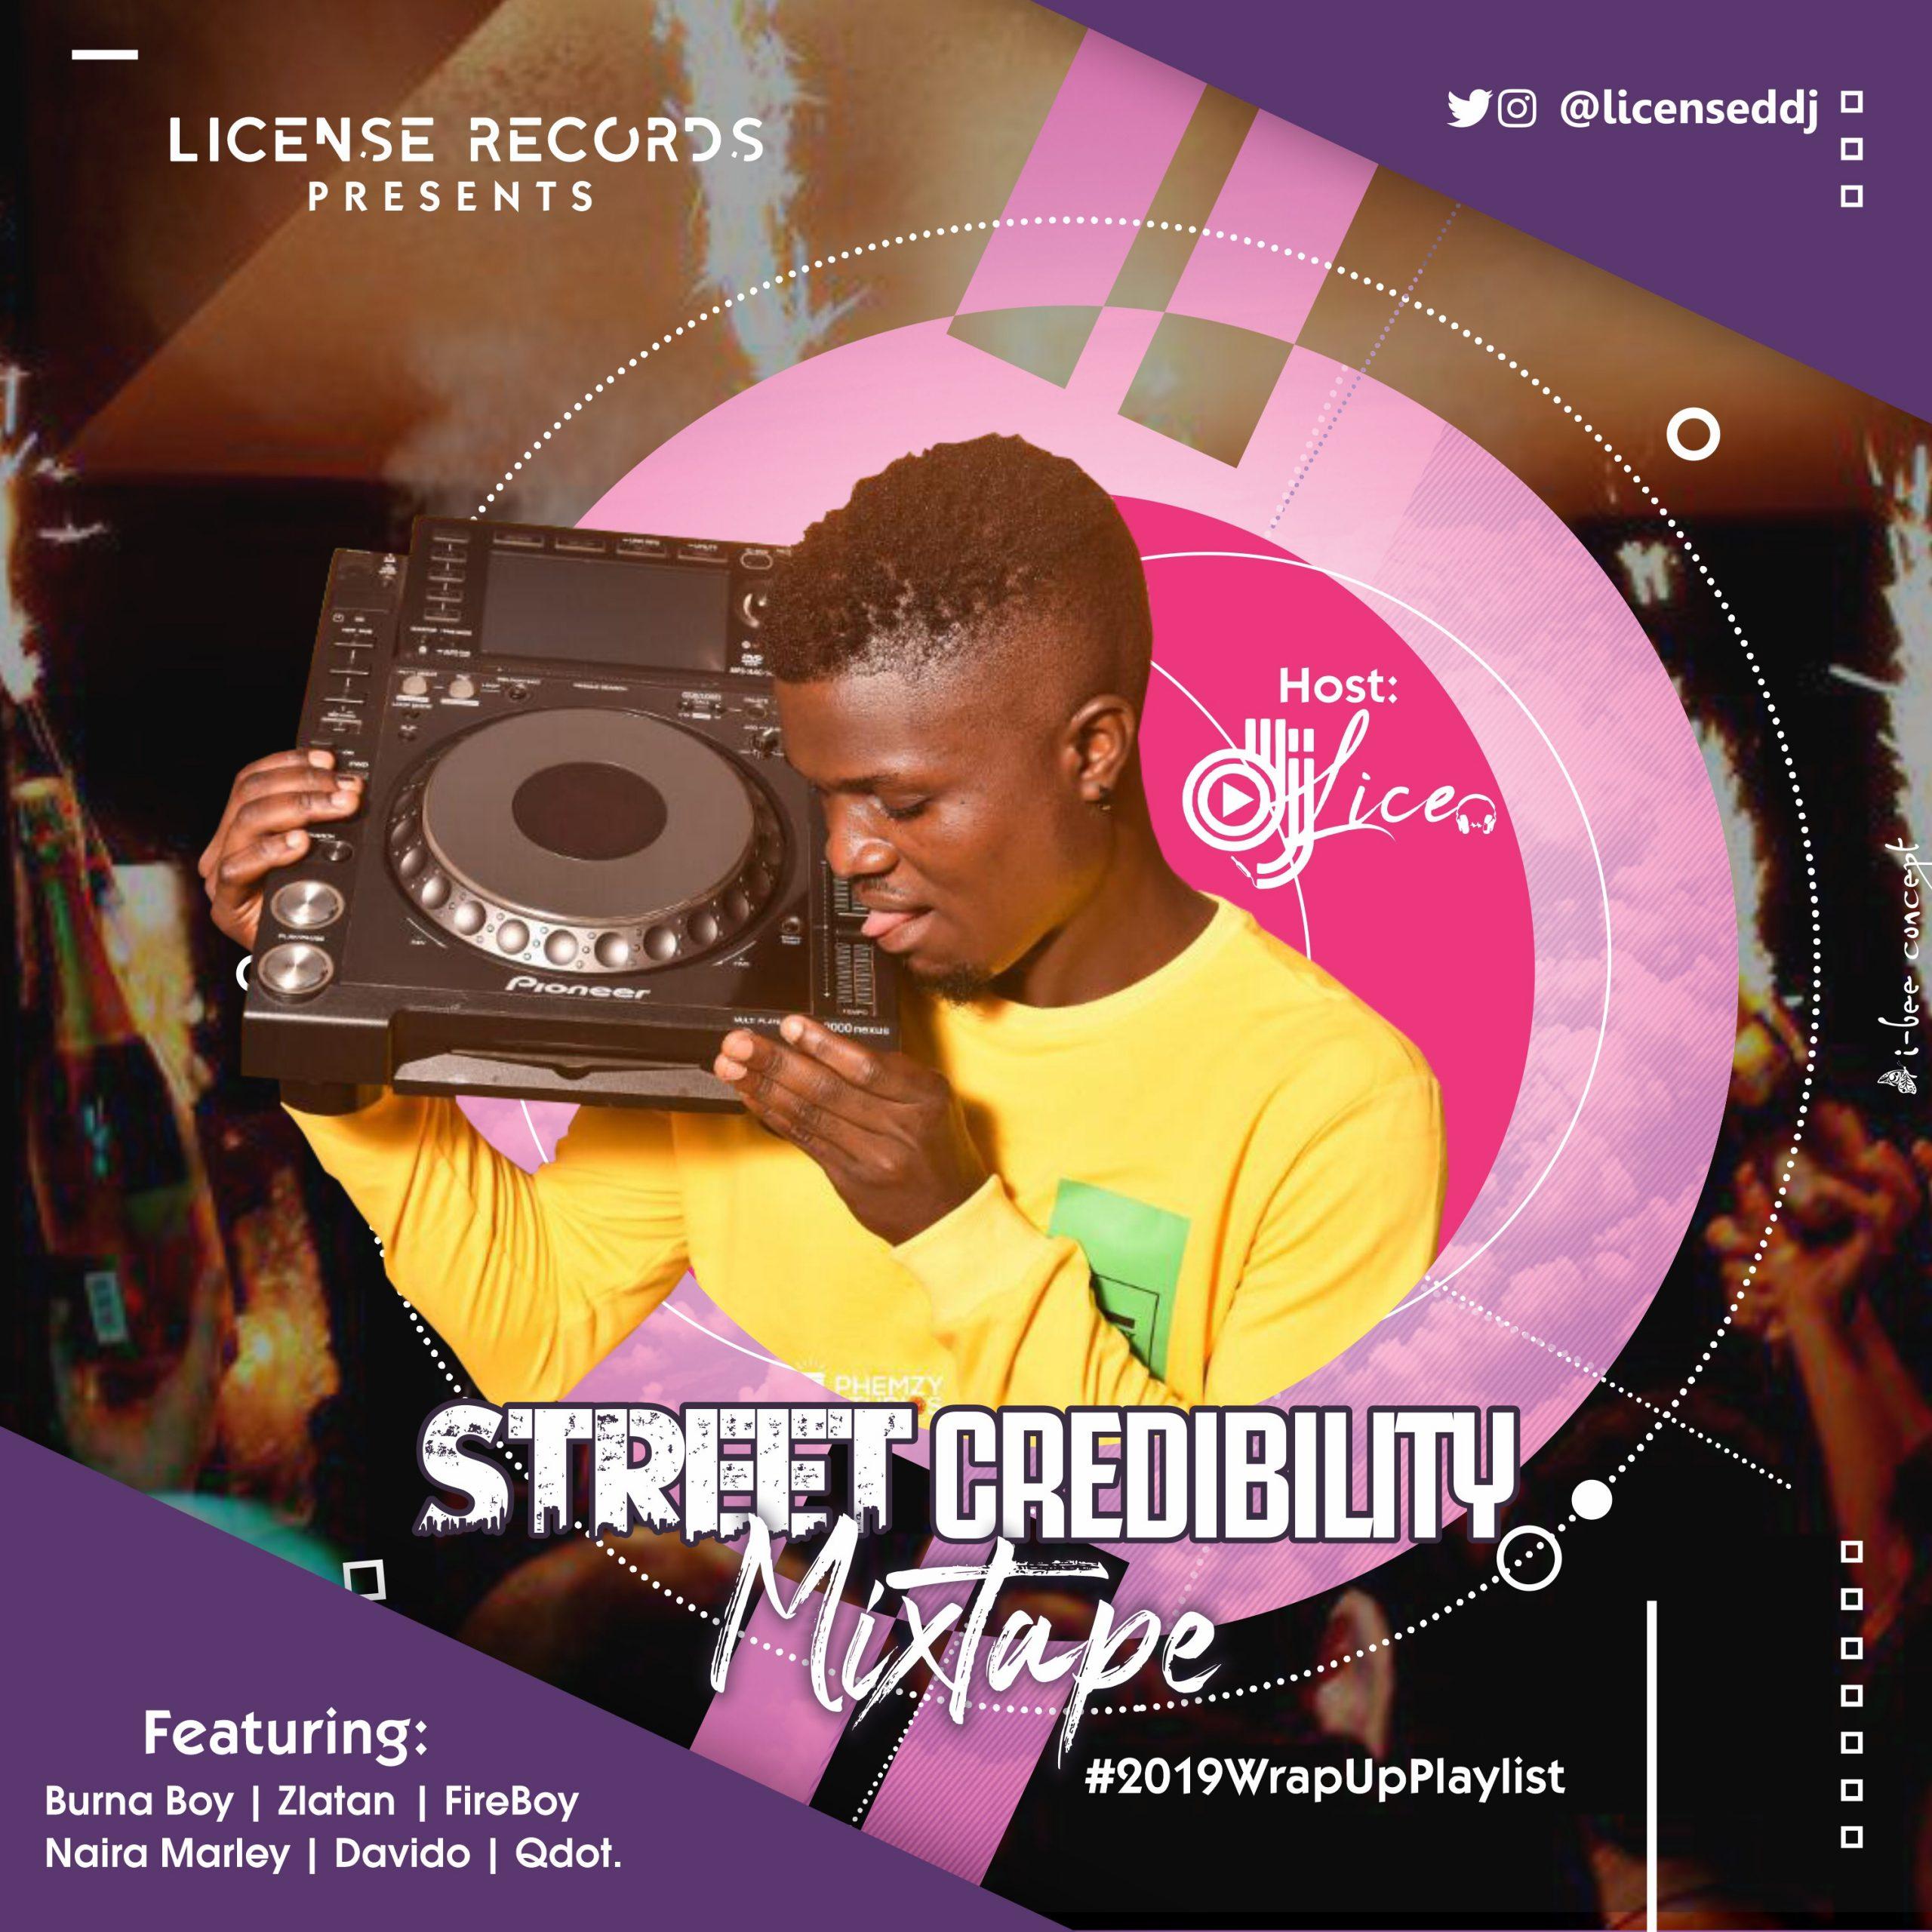 Dj Lice - Street Credibility Mix